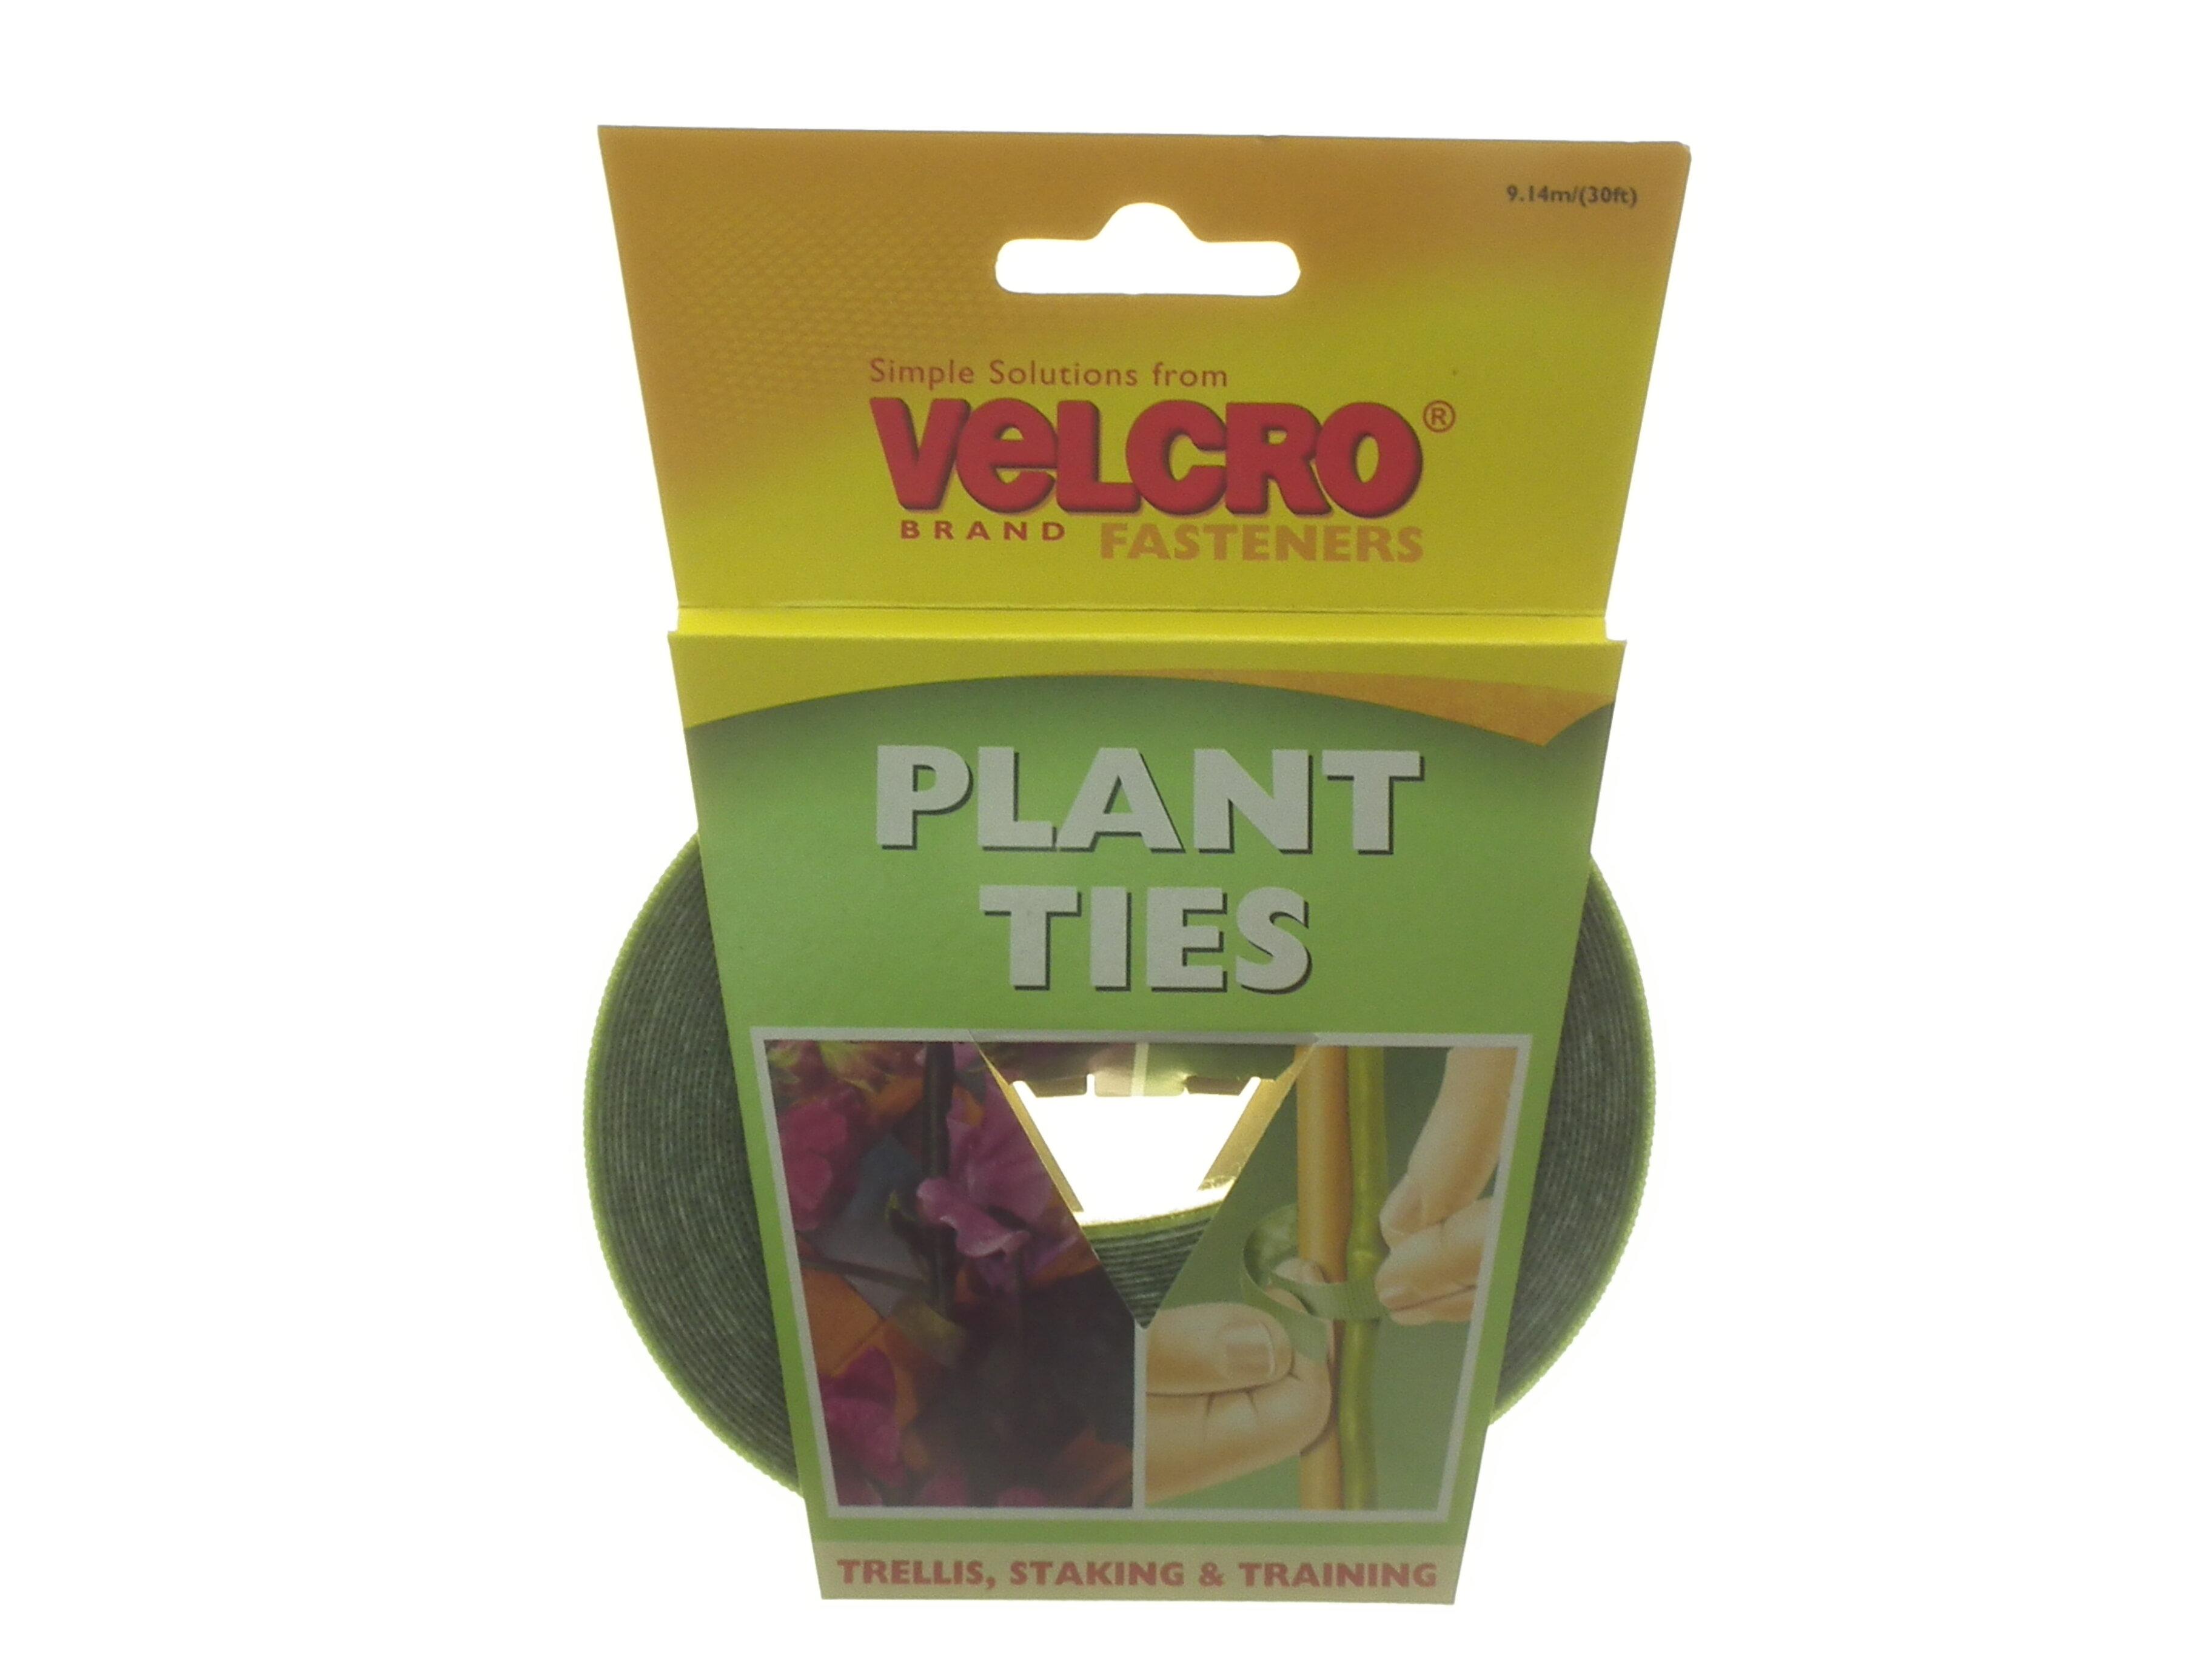 VELCRO PLANT TIES 15 MM X 9.14 MTR